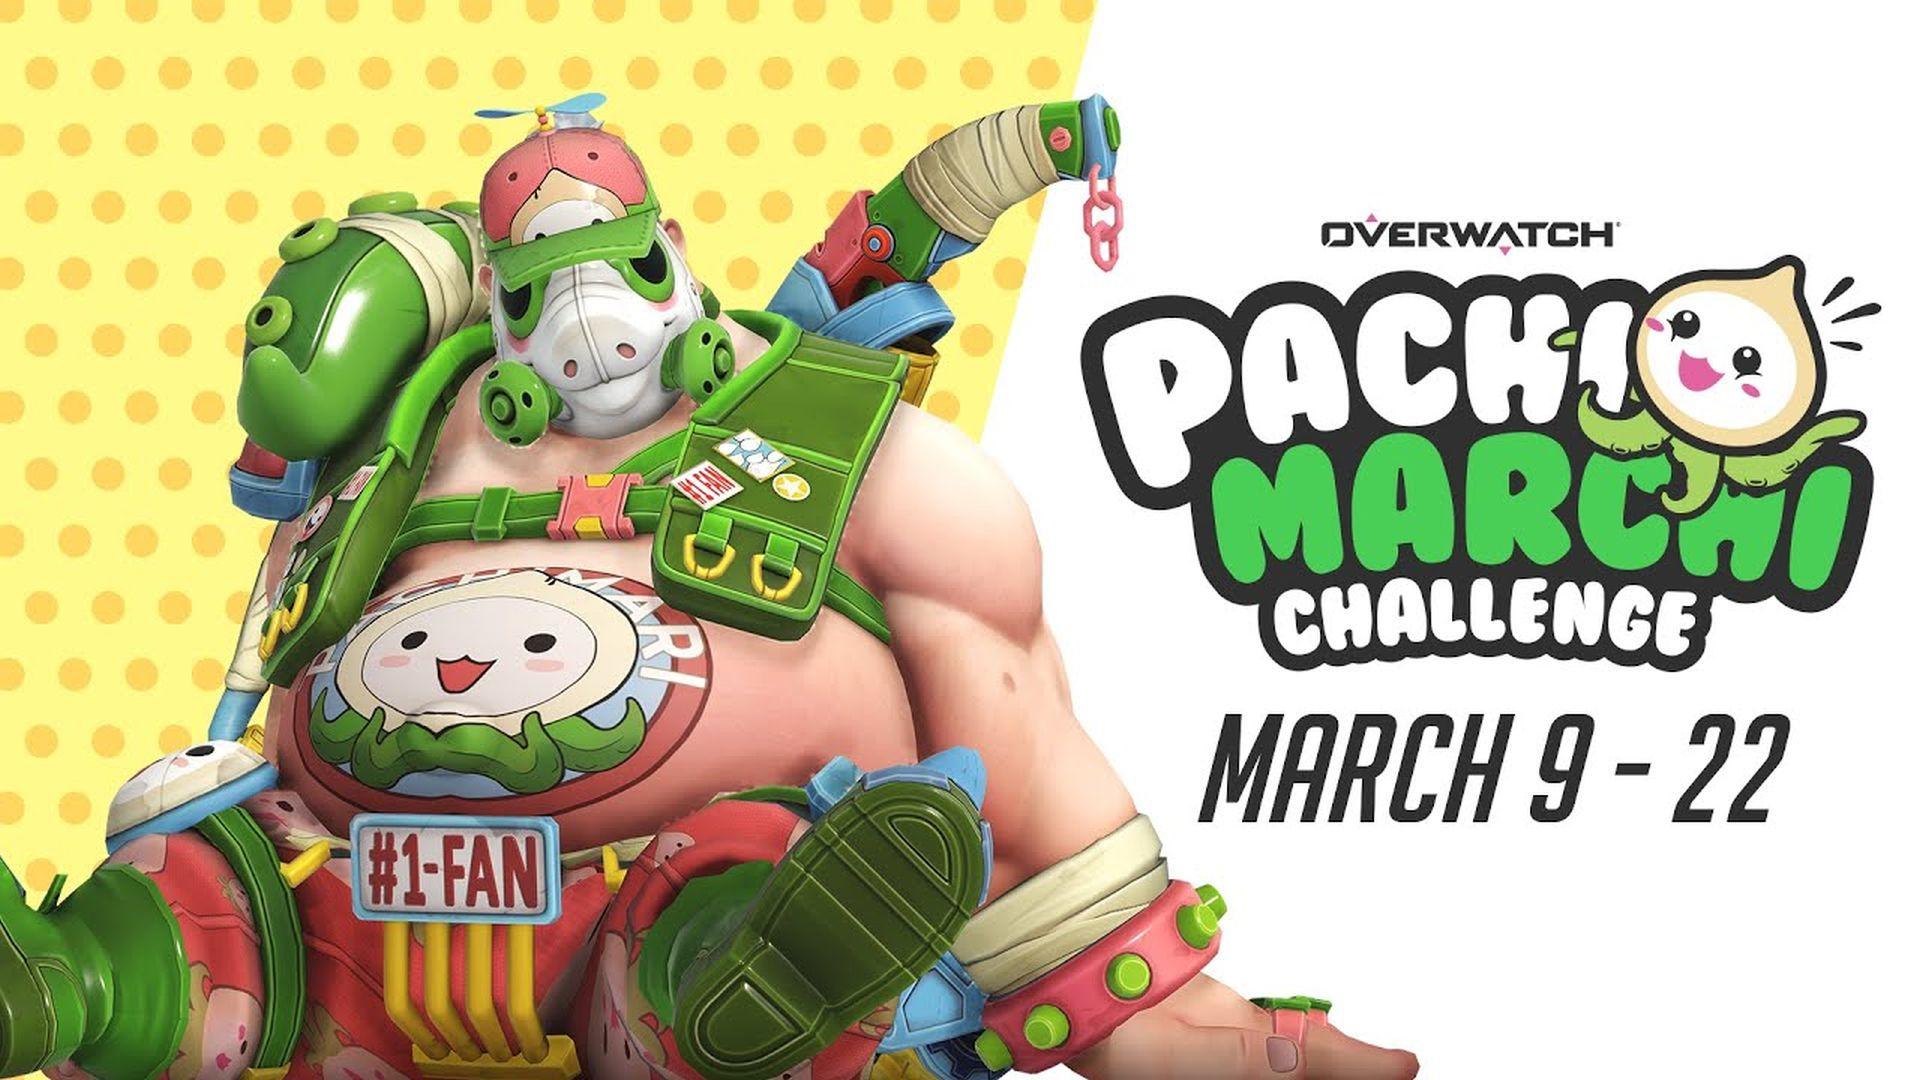 Overwatch PachiMarchi Challenge